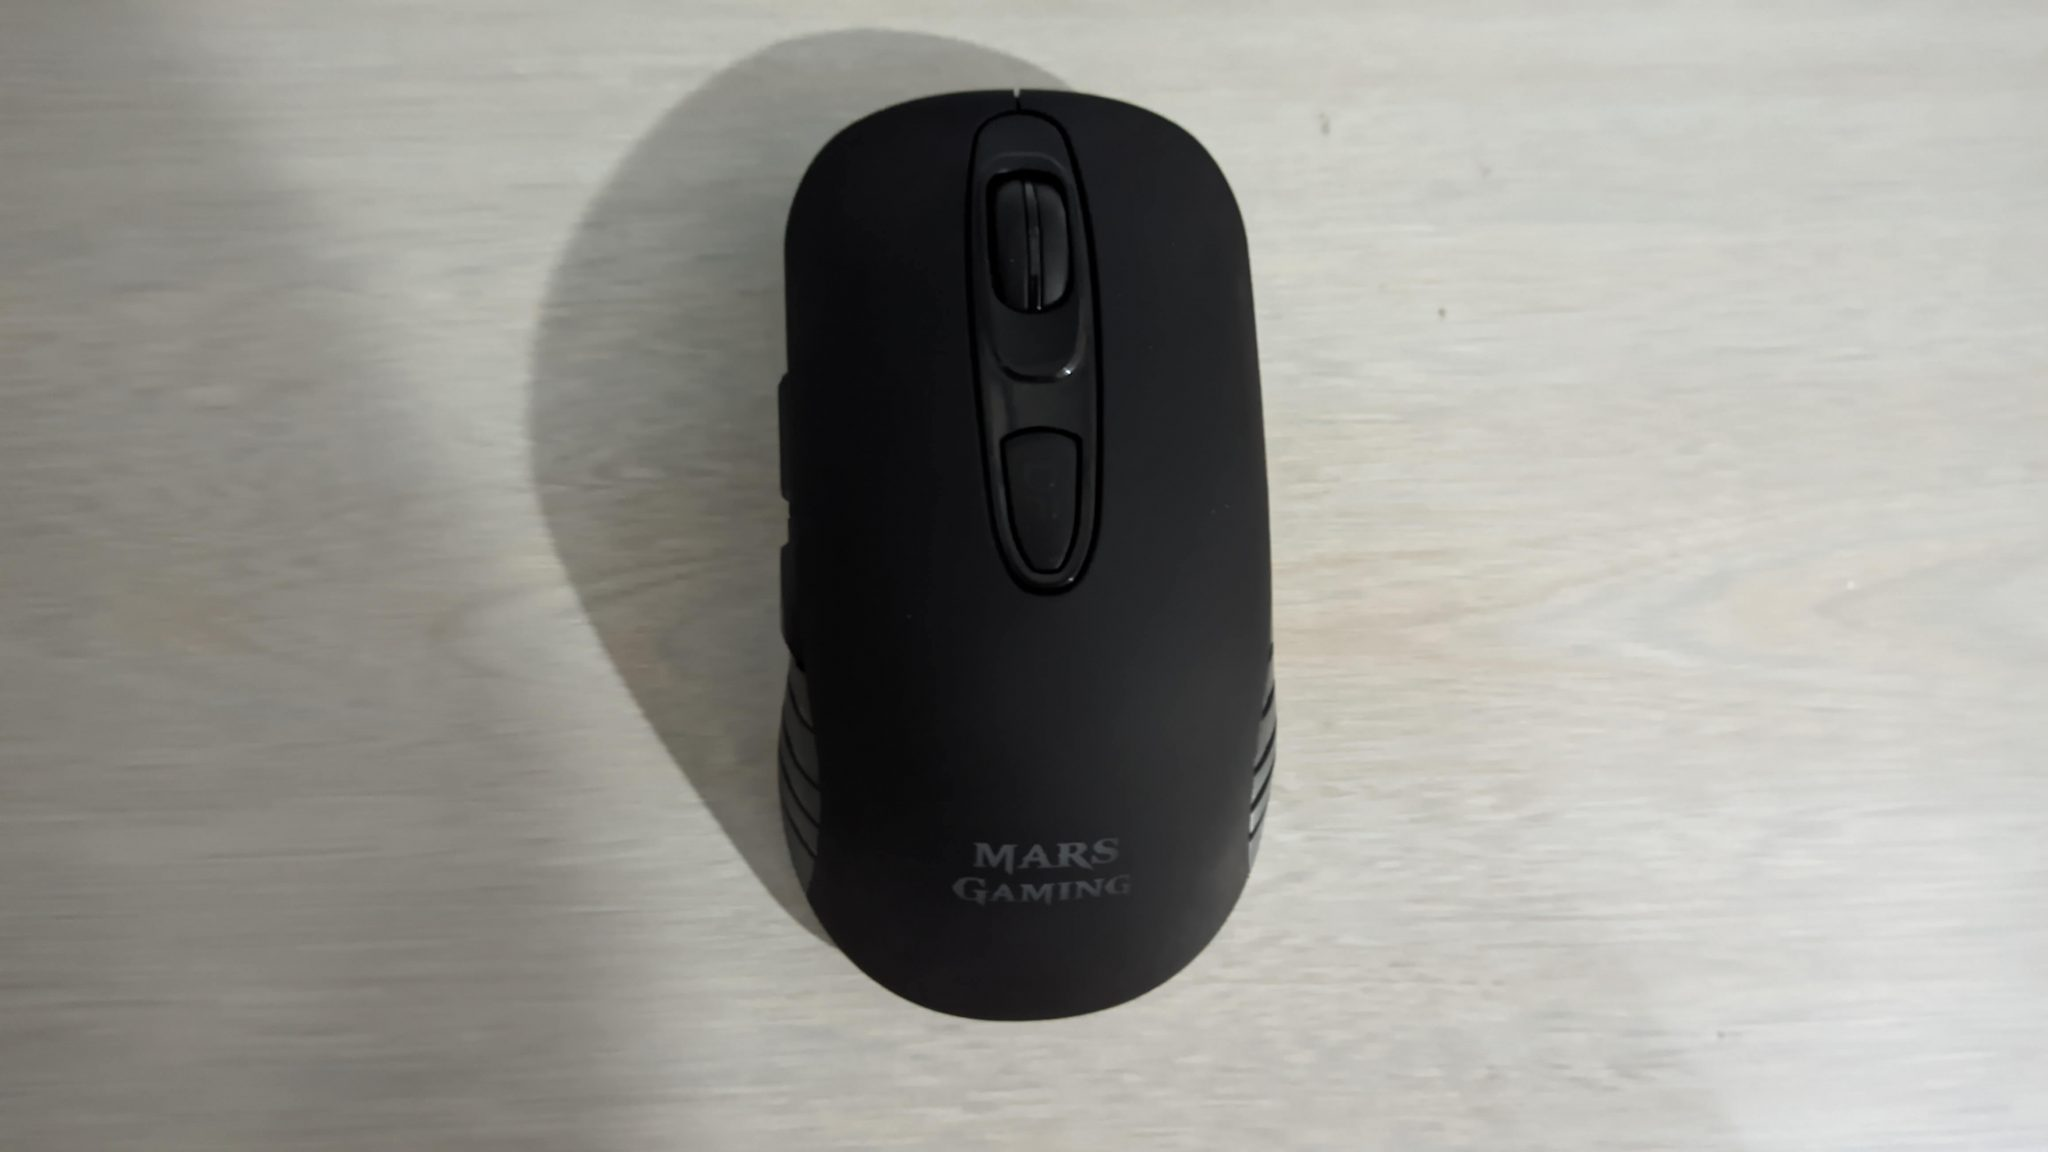 Ratón inalámbrico Mars Gaming MMW2 - Review en Español